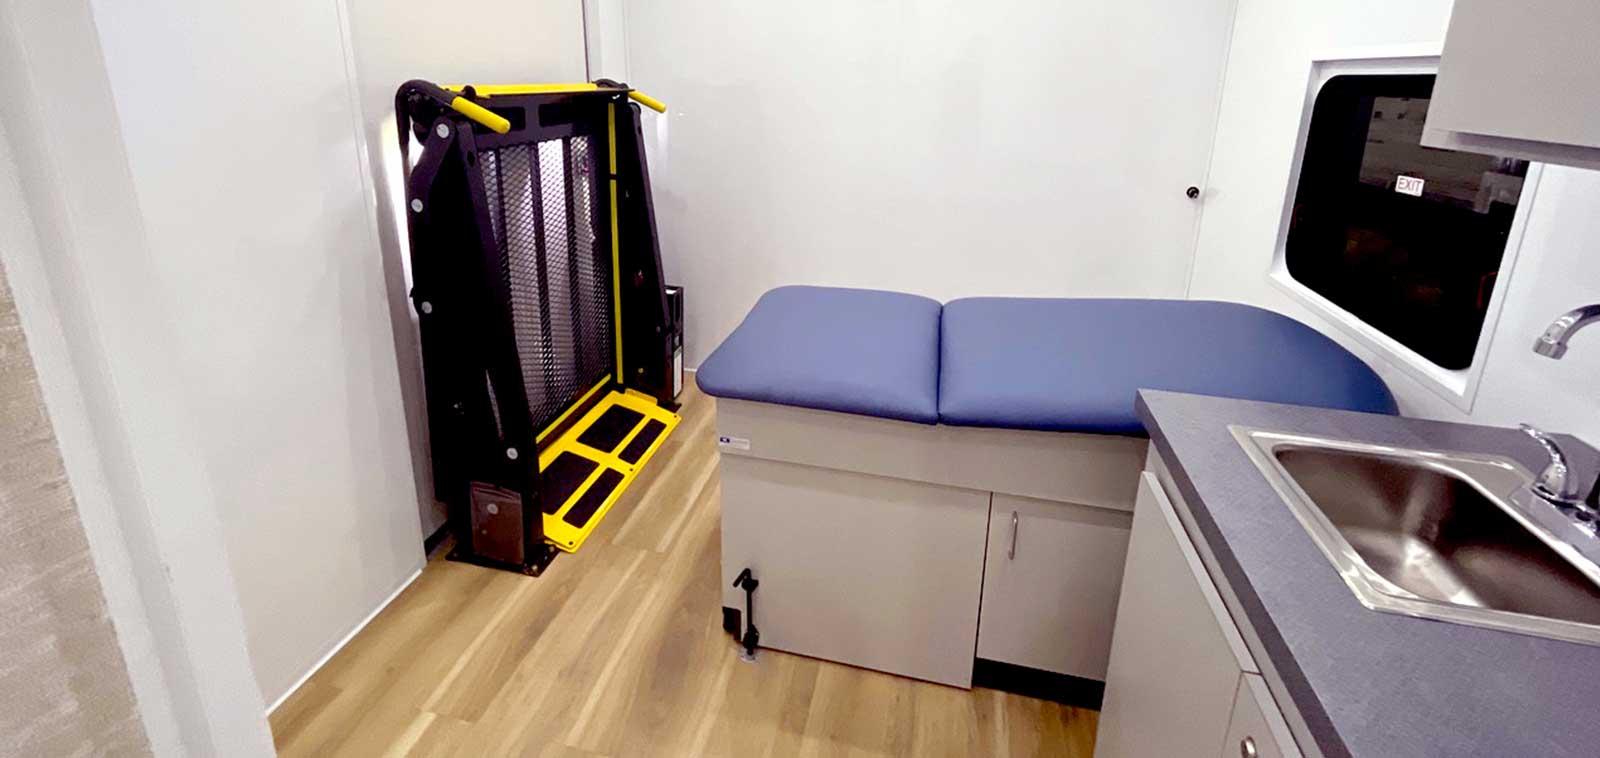 Plan_A_Medical_Box_Truck_5